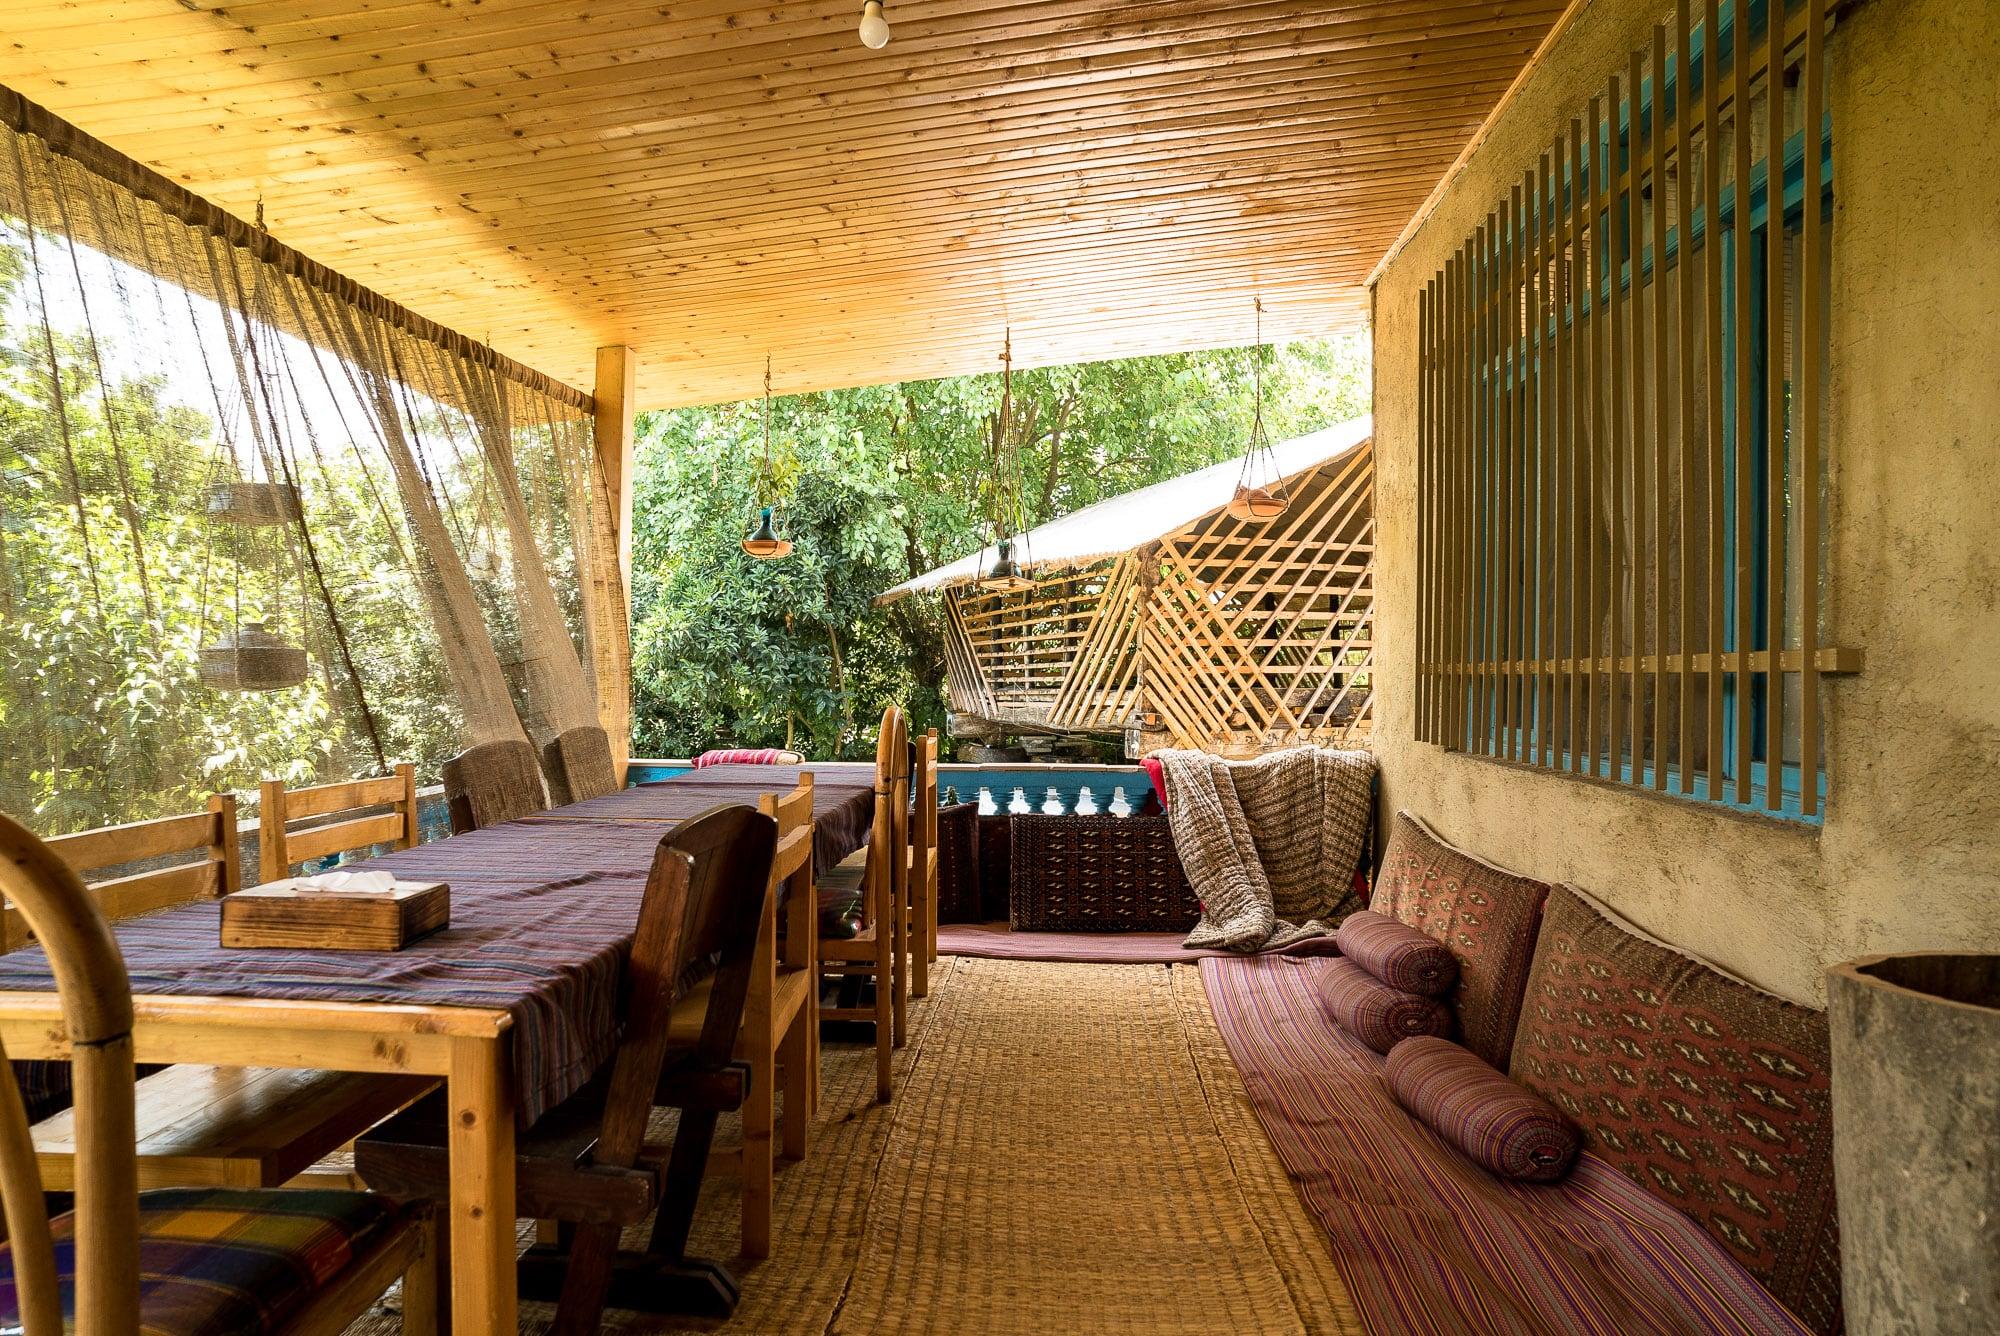 Gileboom verandah